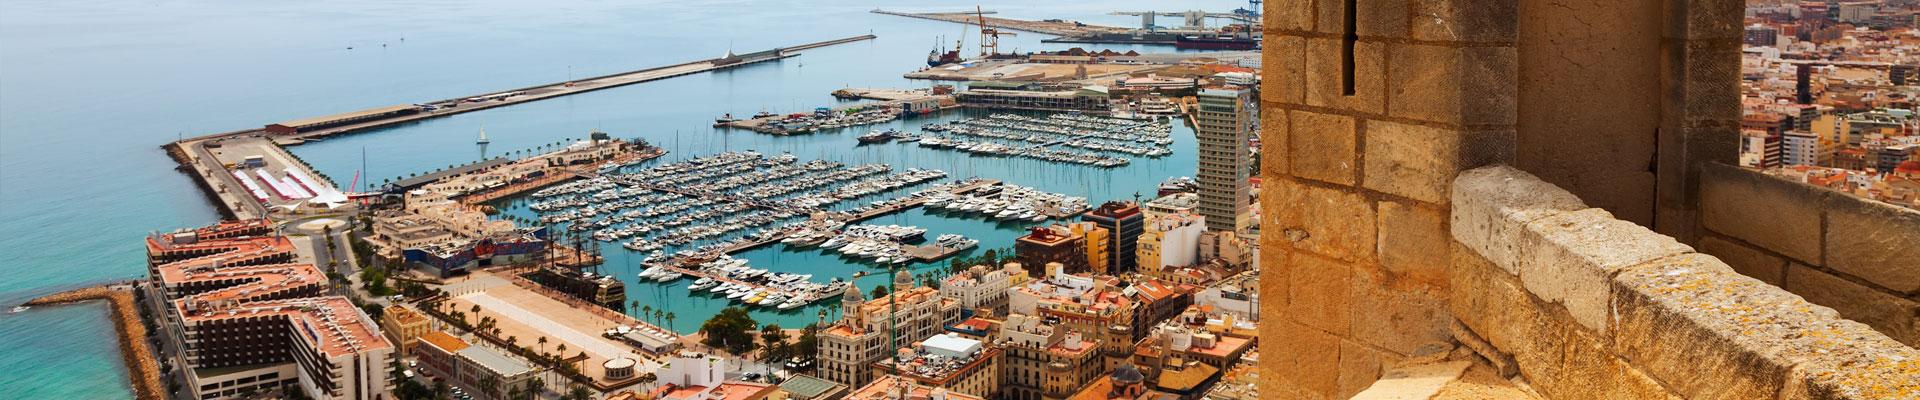 Curso de bolsa en Alicante